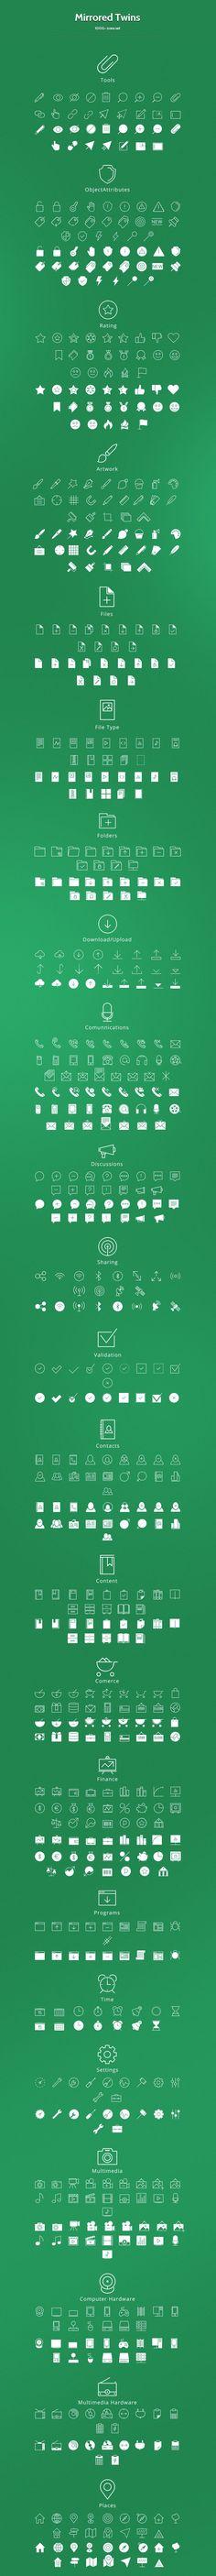 Mirrored Twins Icon Set by WordPress Design Awards , via Behance Web Design, Icon Design, Graphic Design, Joomla Themes, Creative Suite, Ecommerce Solutions, Wordpress Theme Design, Planner Template, Website Themes